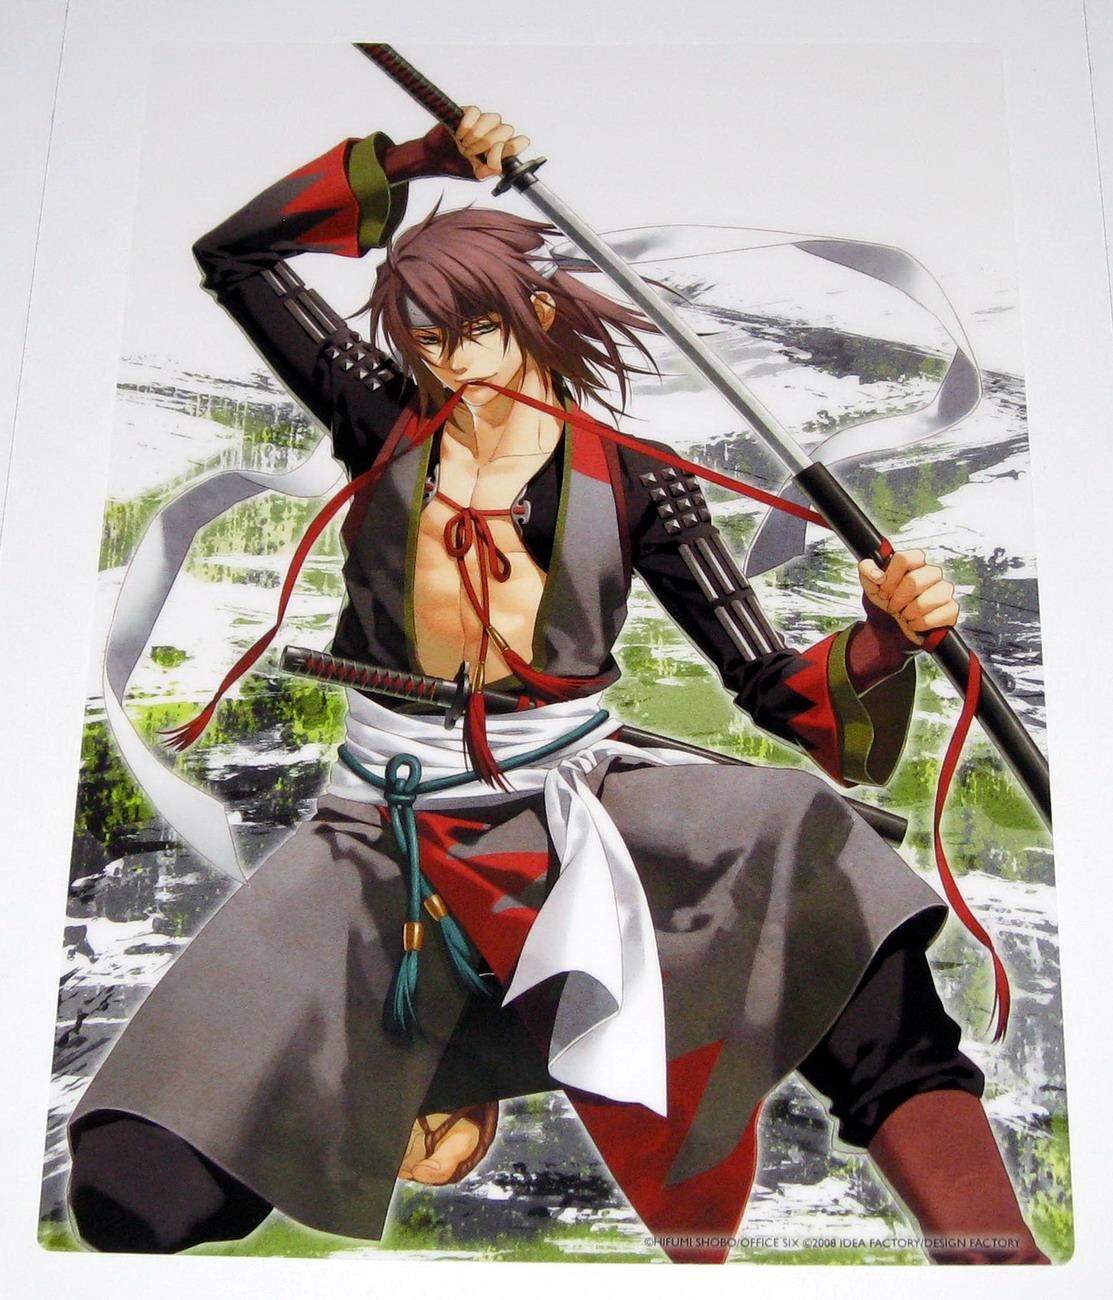 Hakuouki Still Collection Premium v6 - 16